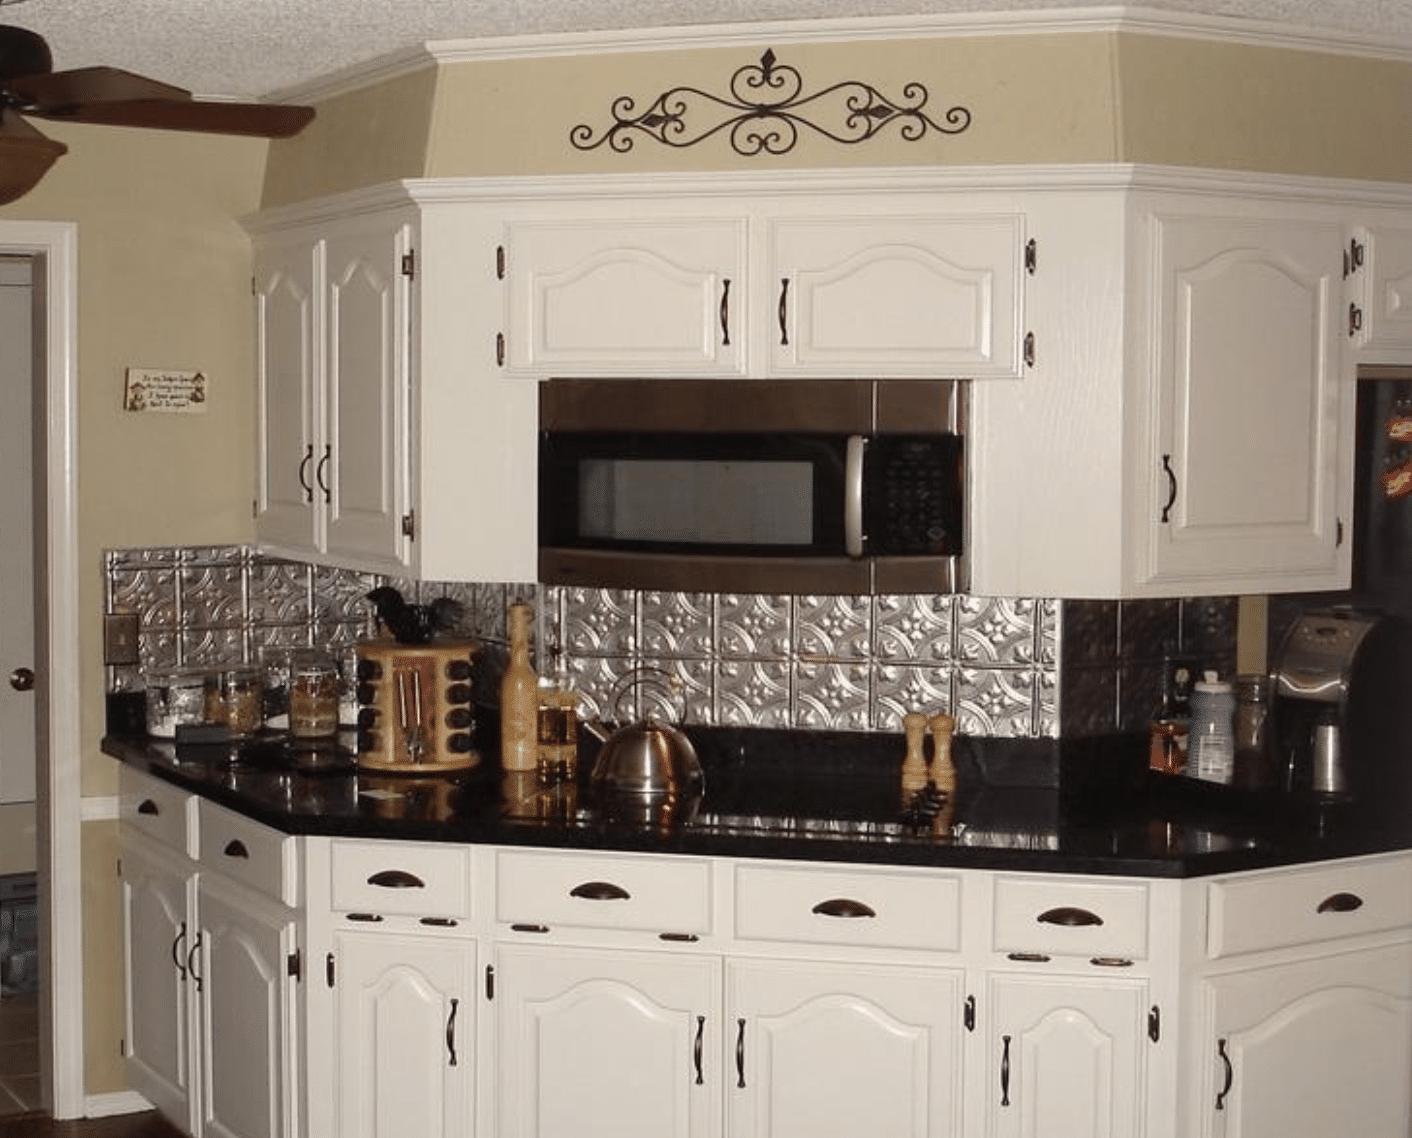 Tile-kitchen-tin-backsplash